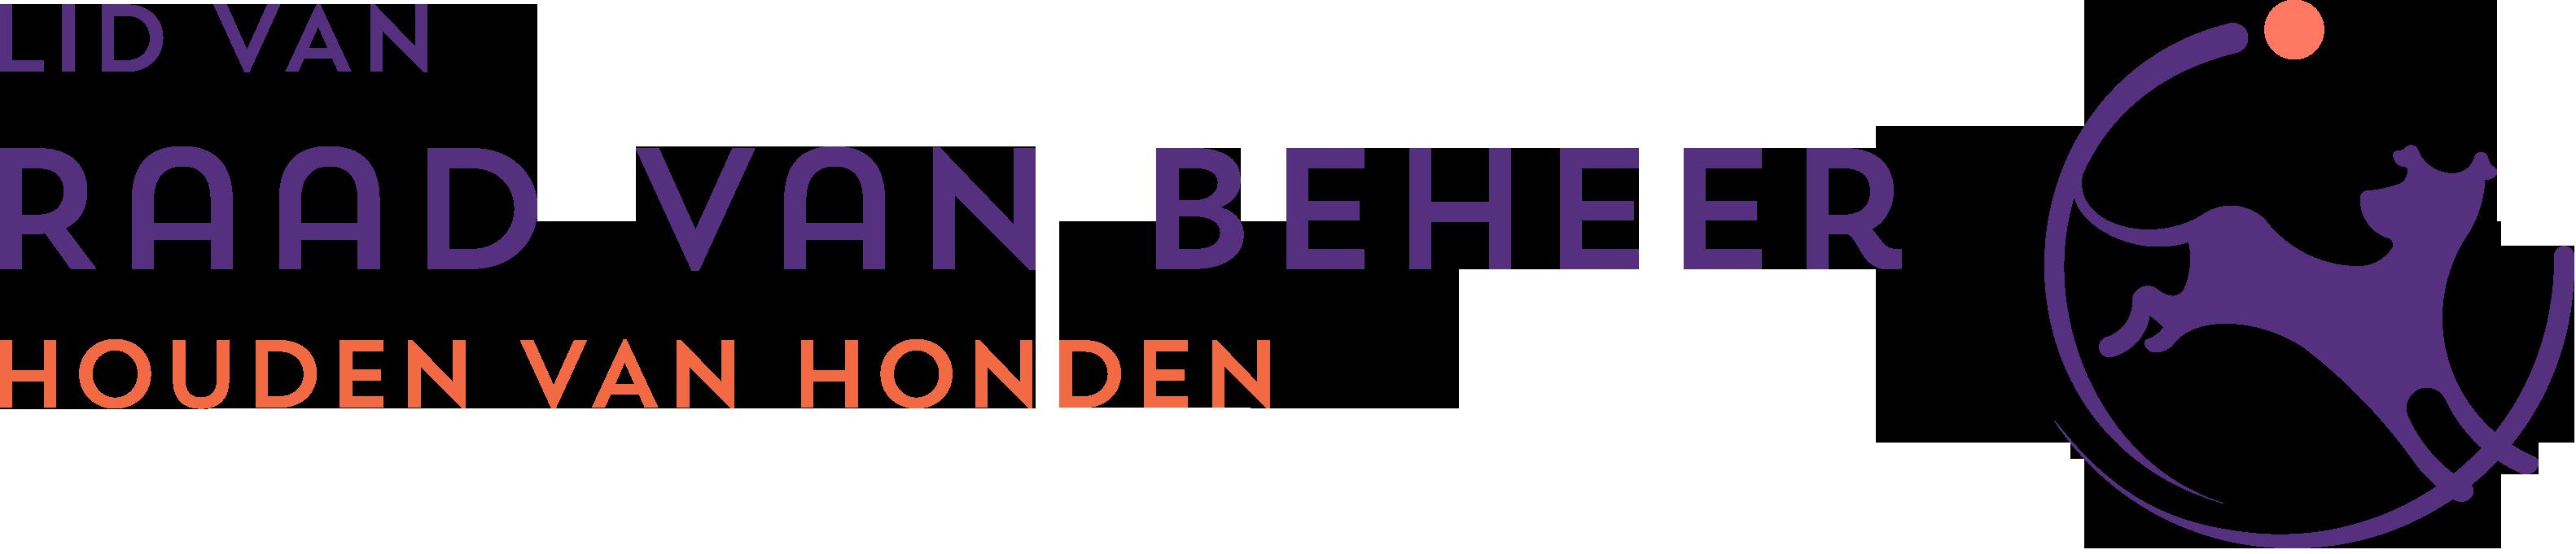 Logo_Lid-van-RvB_Horizontaal_CMYK_Basis